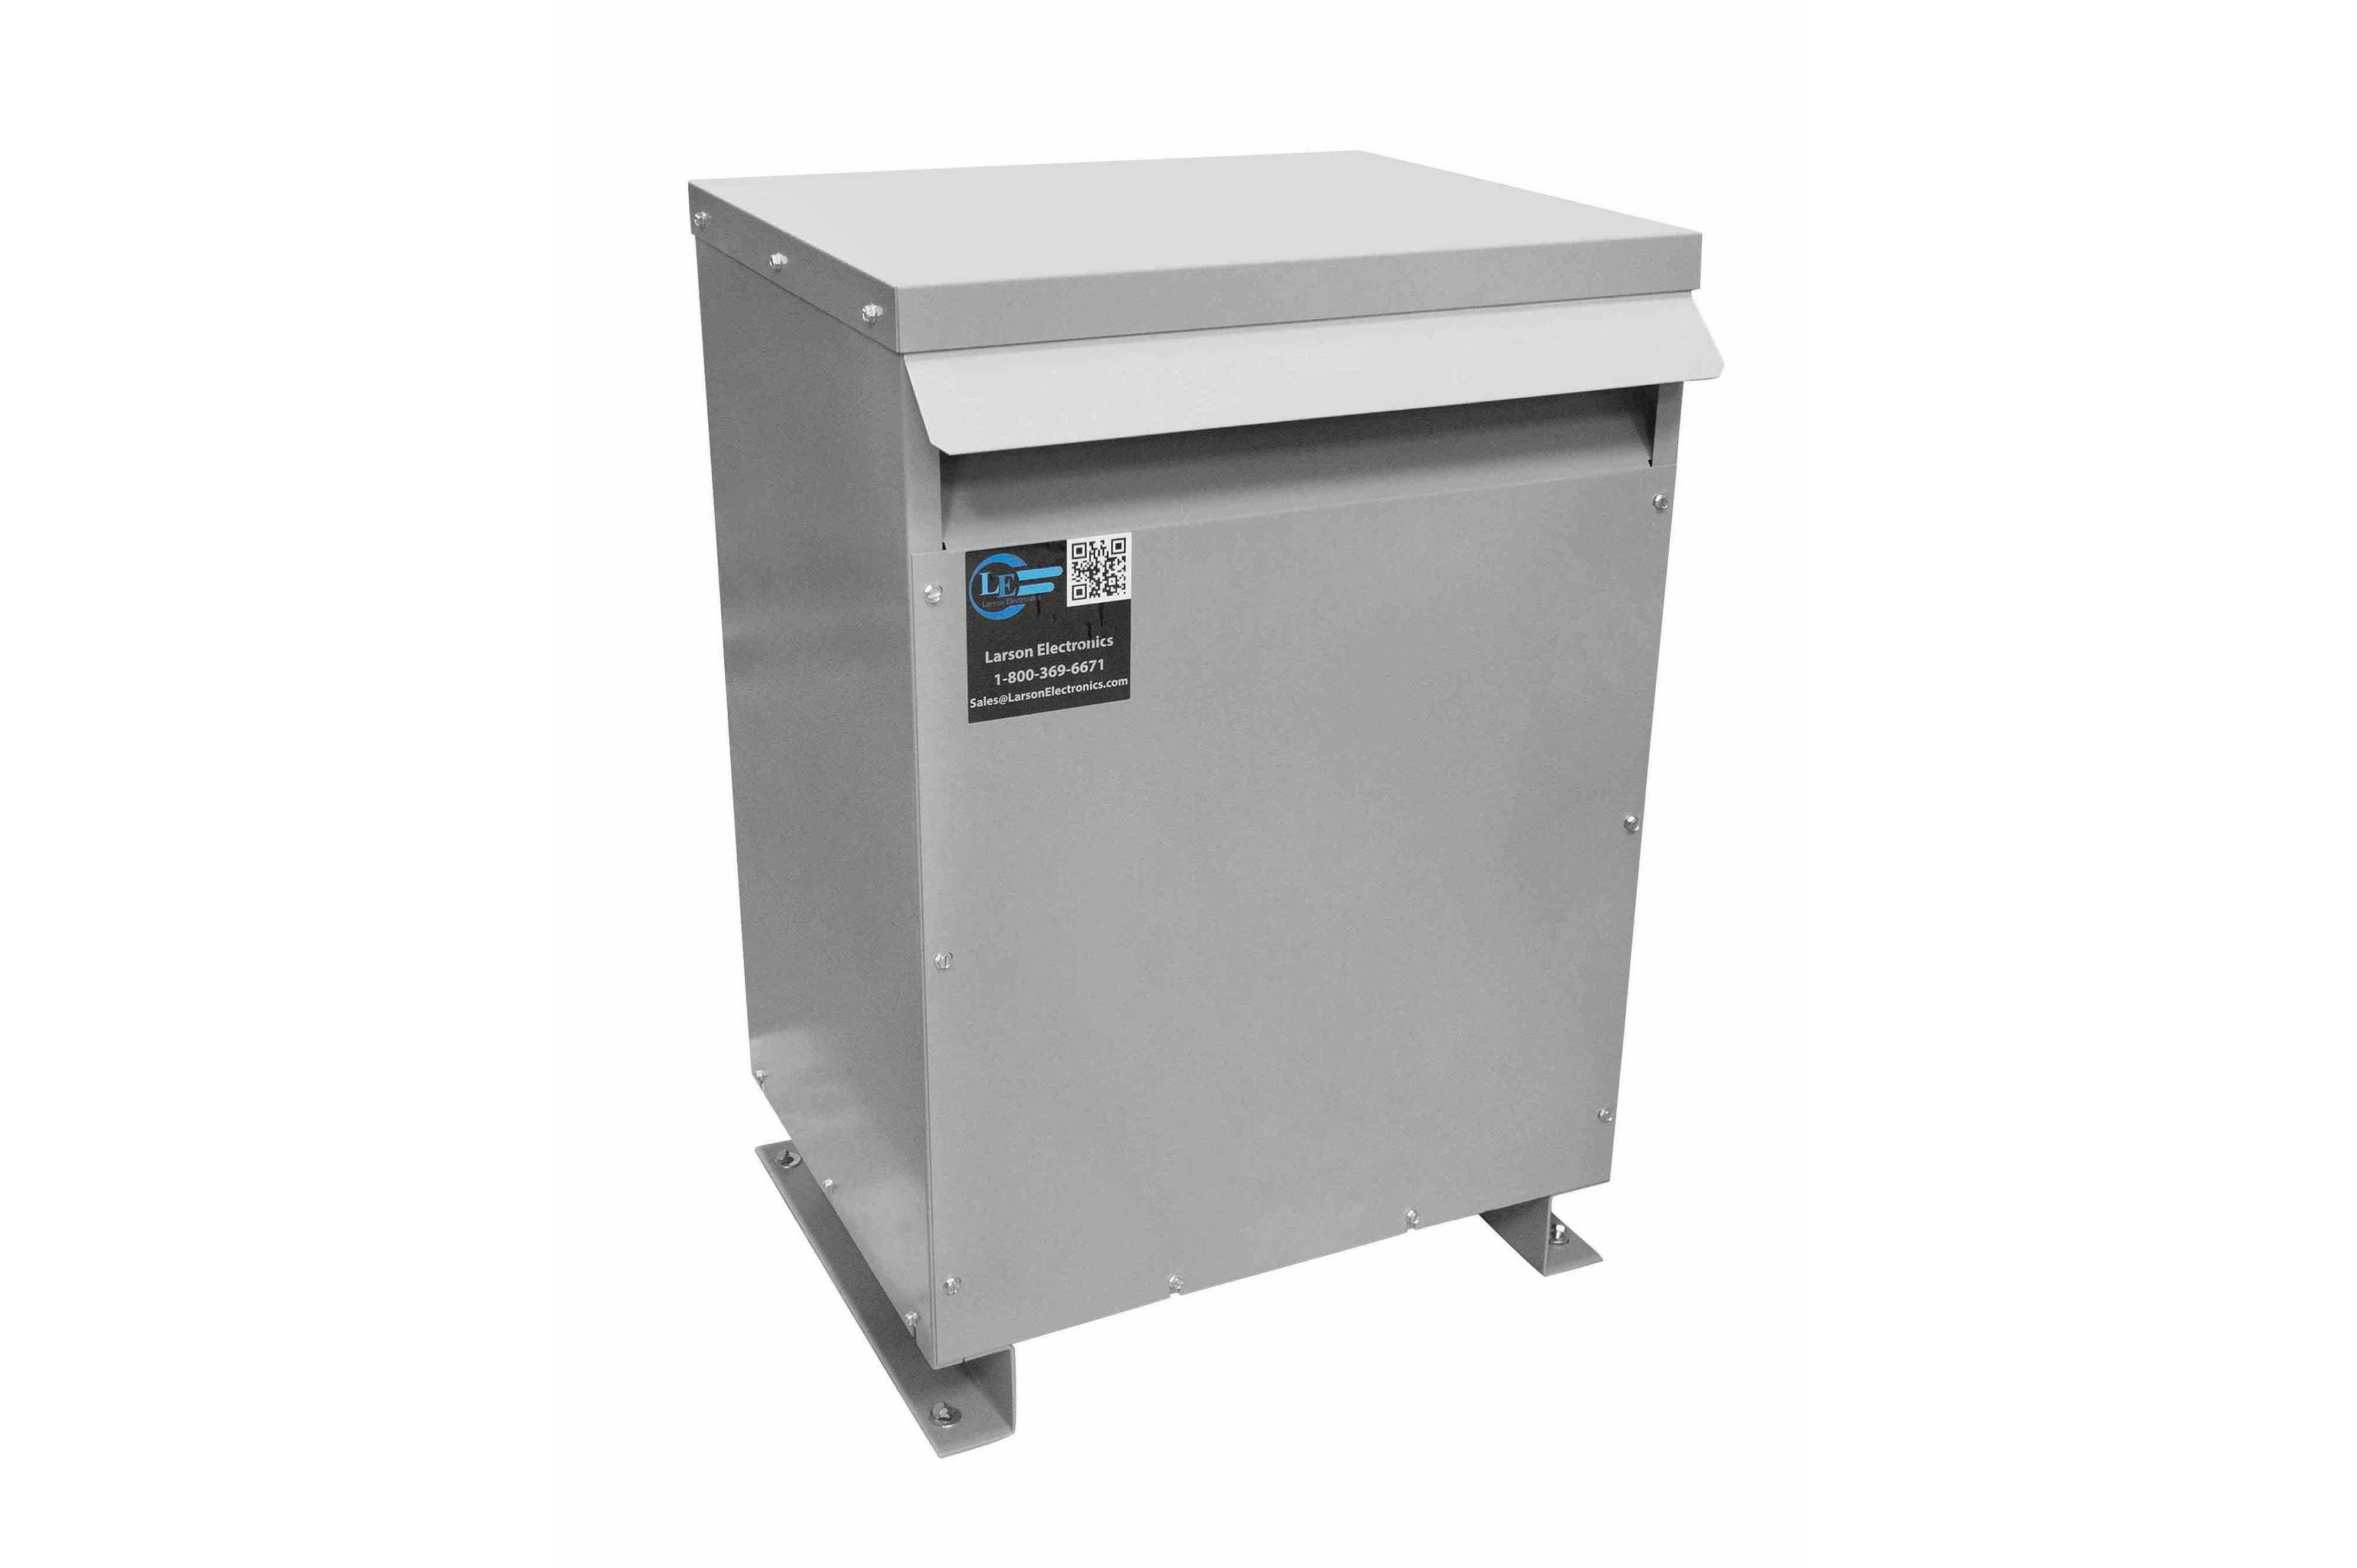 42.5 kVA 3PH Isolation Transformer, 440V Wye Primary, 208V Delta Secondary, N3R, Ventilated, 60 Hz